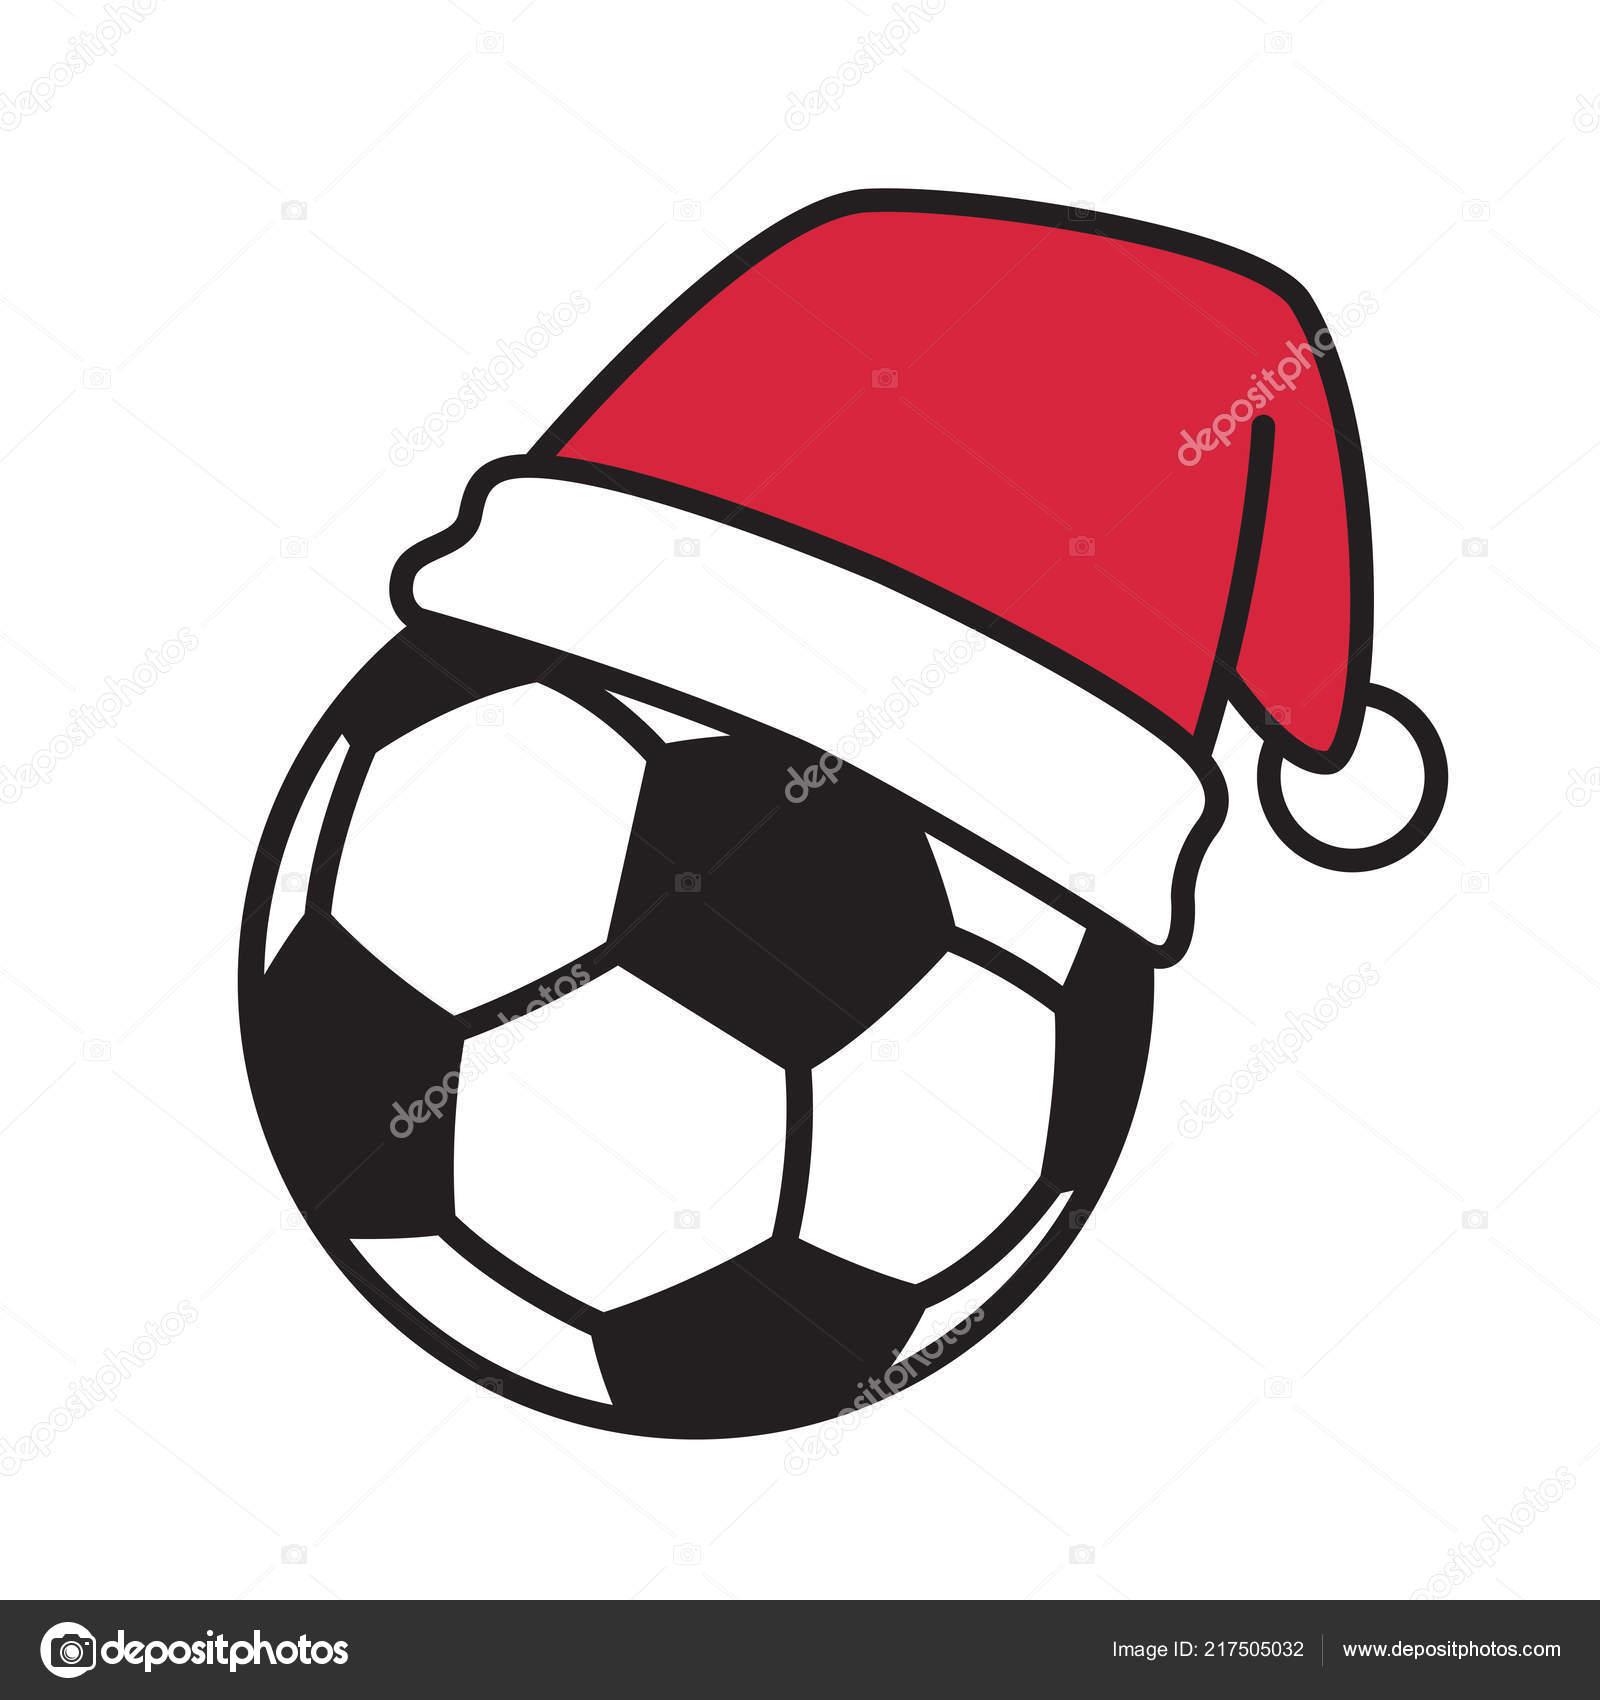 Soccer Ball Vektor Fussball Weihnachten Mutze Weihnachtsmann